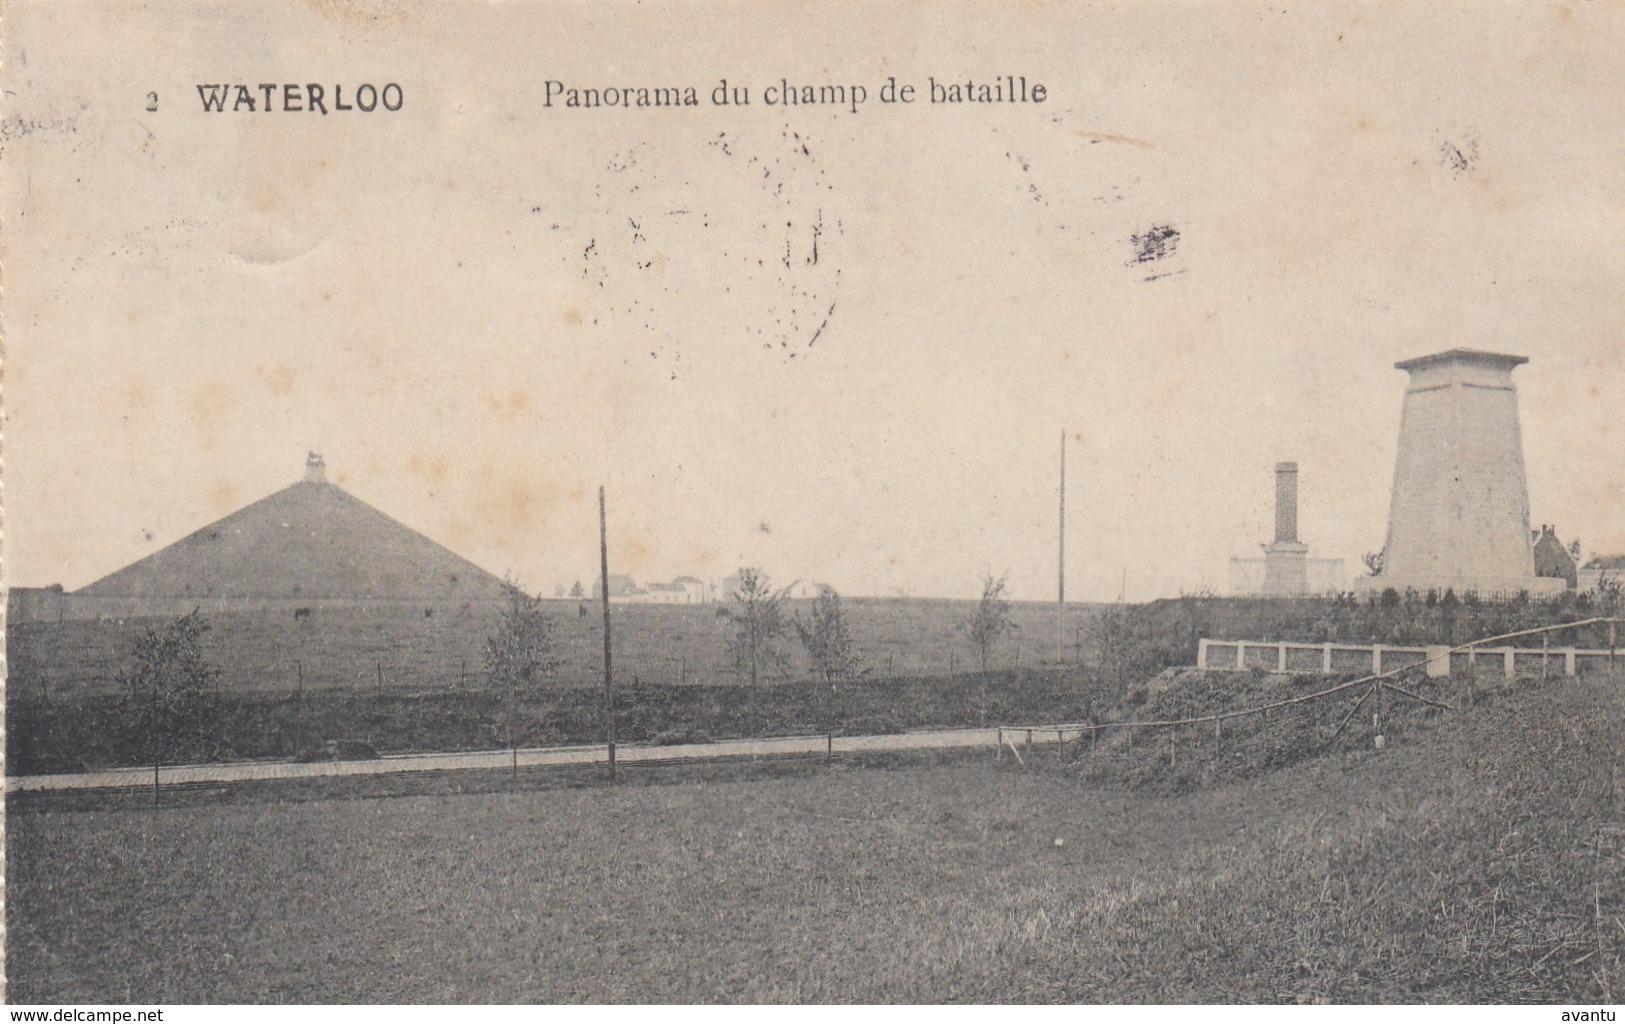 WATERLOO / PANORAMA DU CHAMP DE BATAILLE - Waterloo